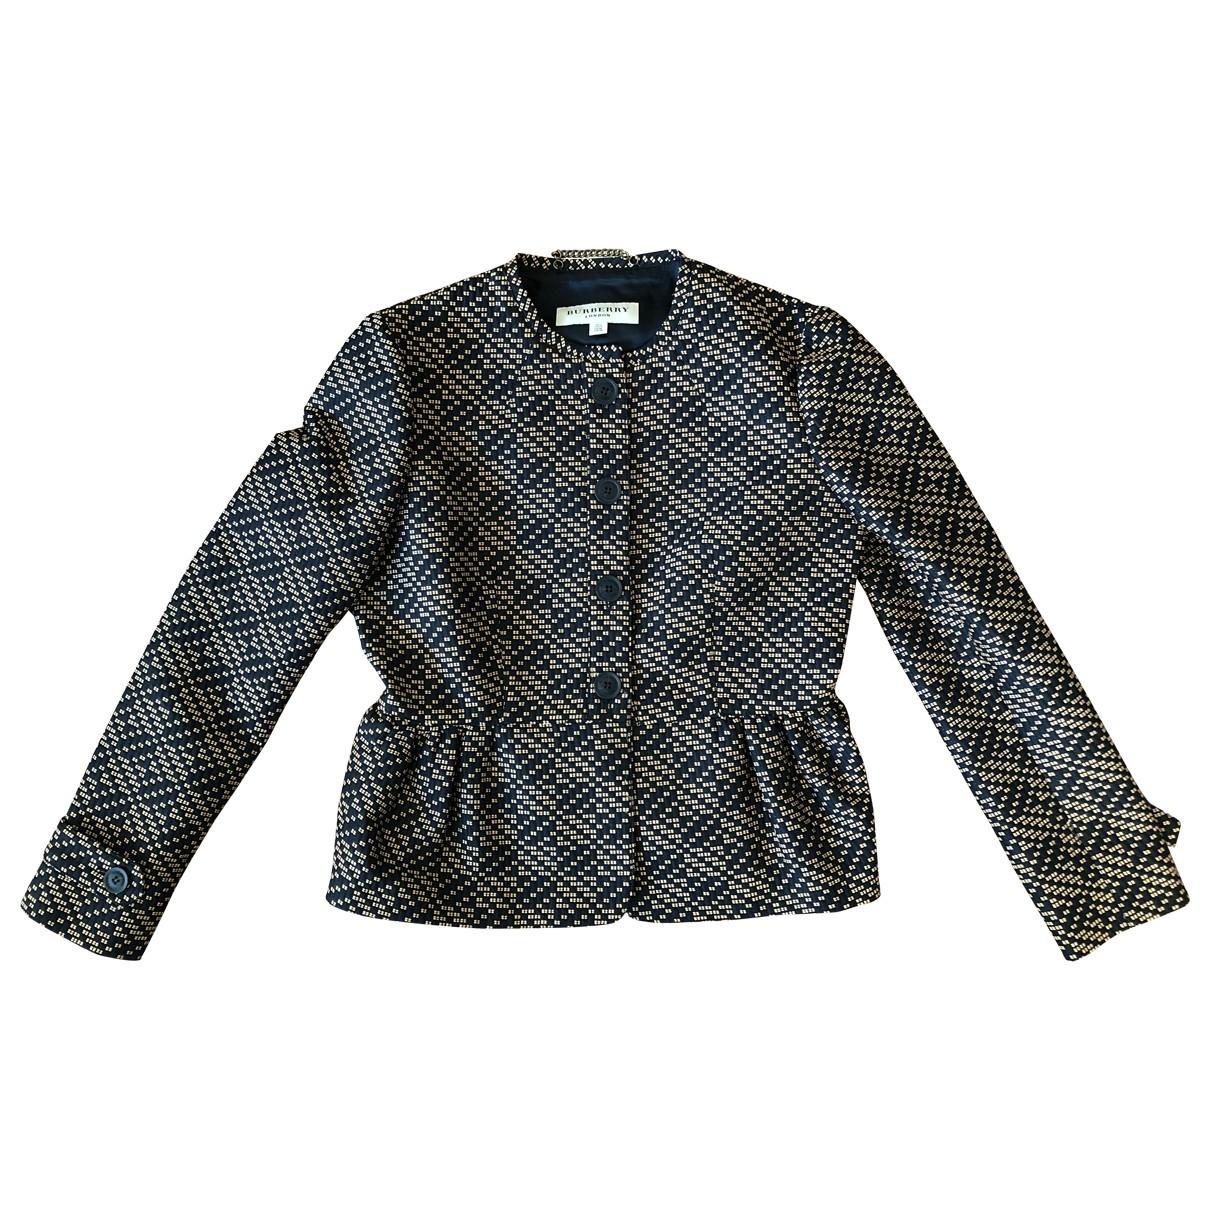 Burberry \N Jacke in  Bunt Polyester